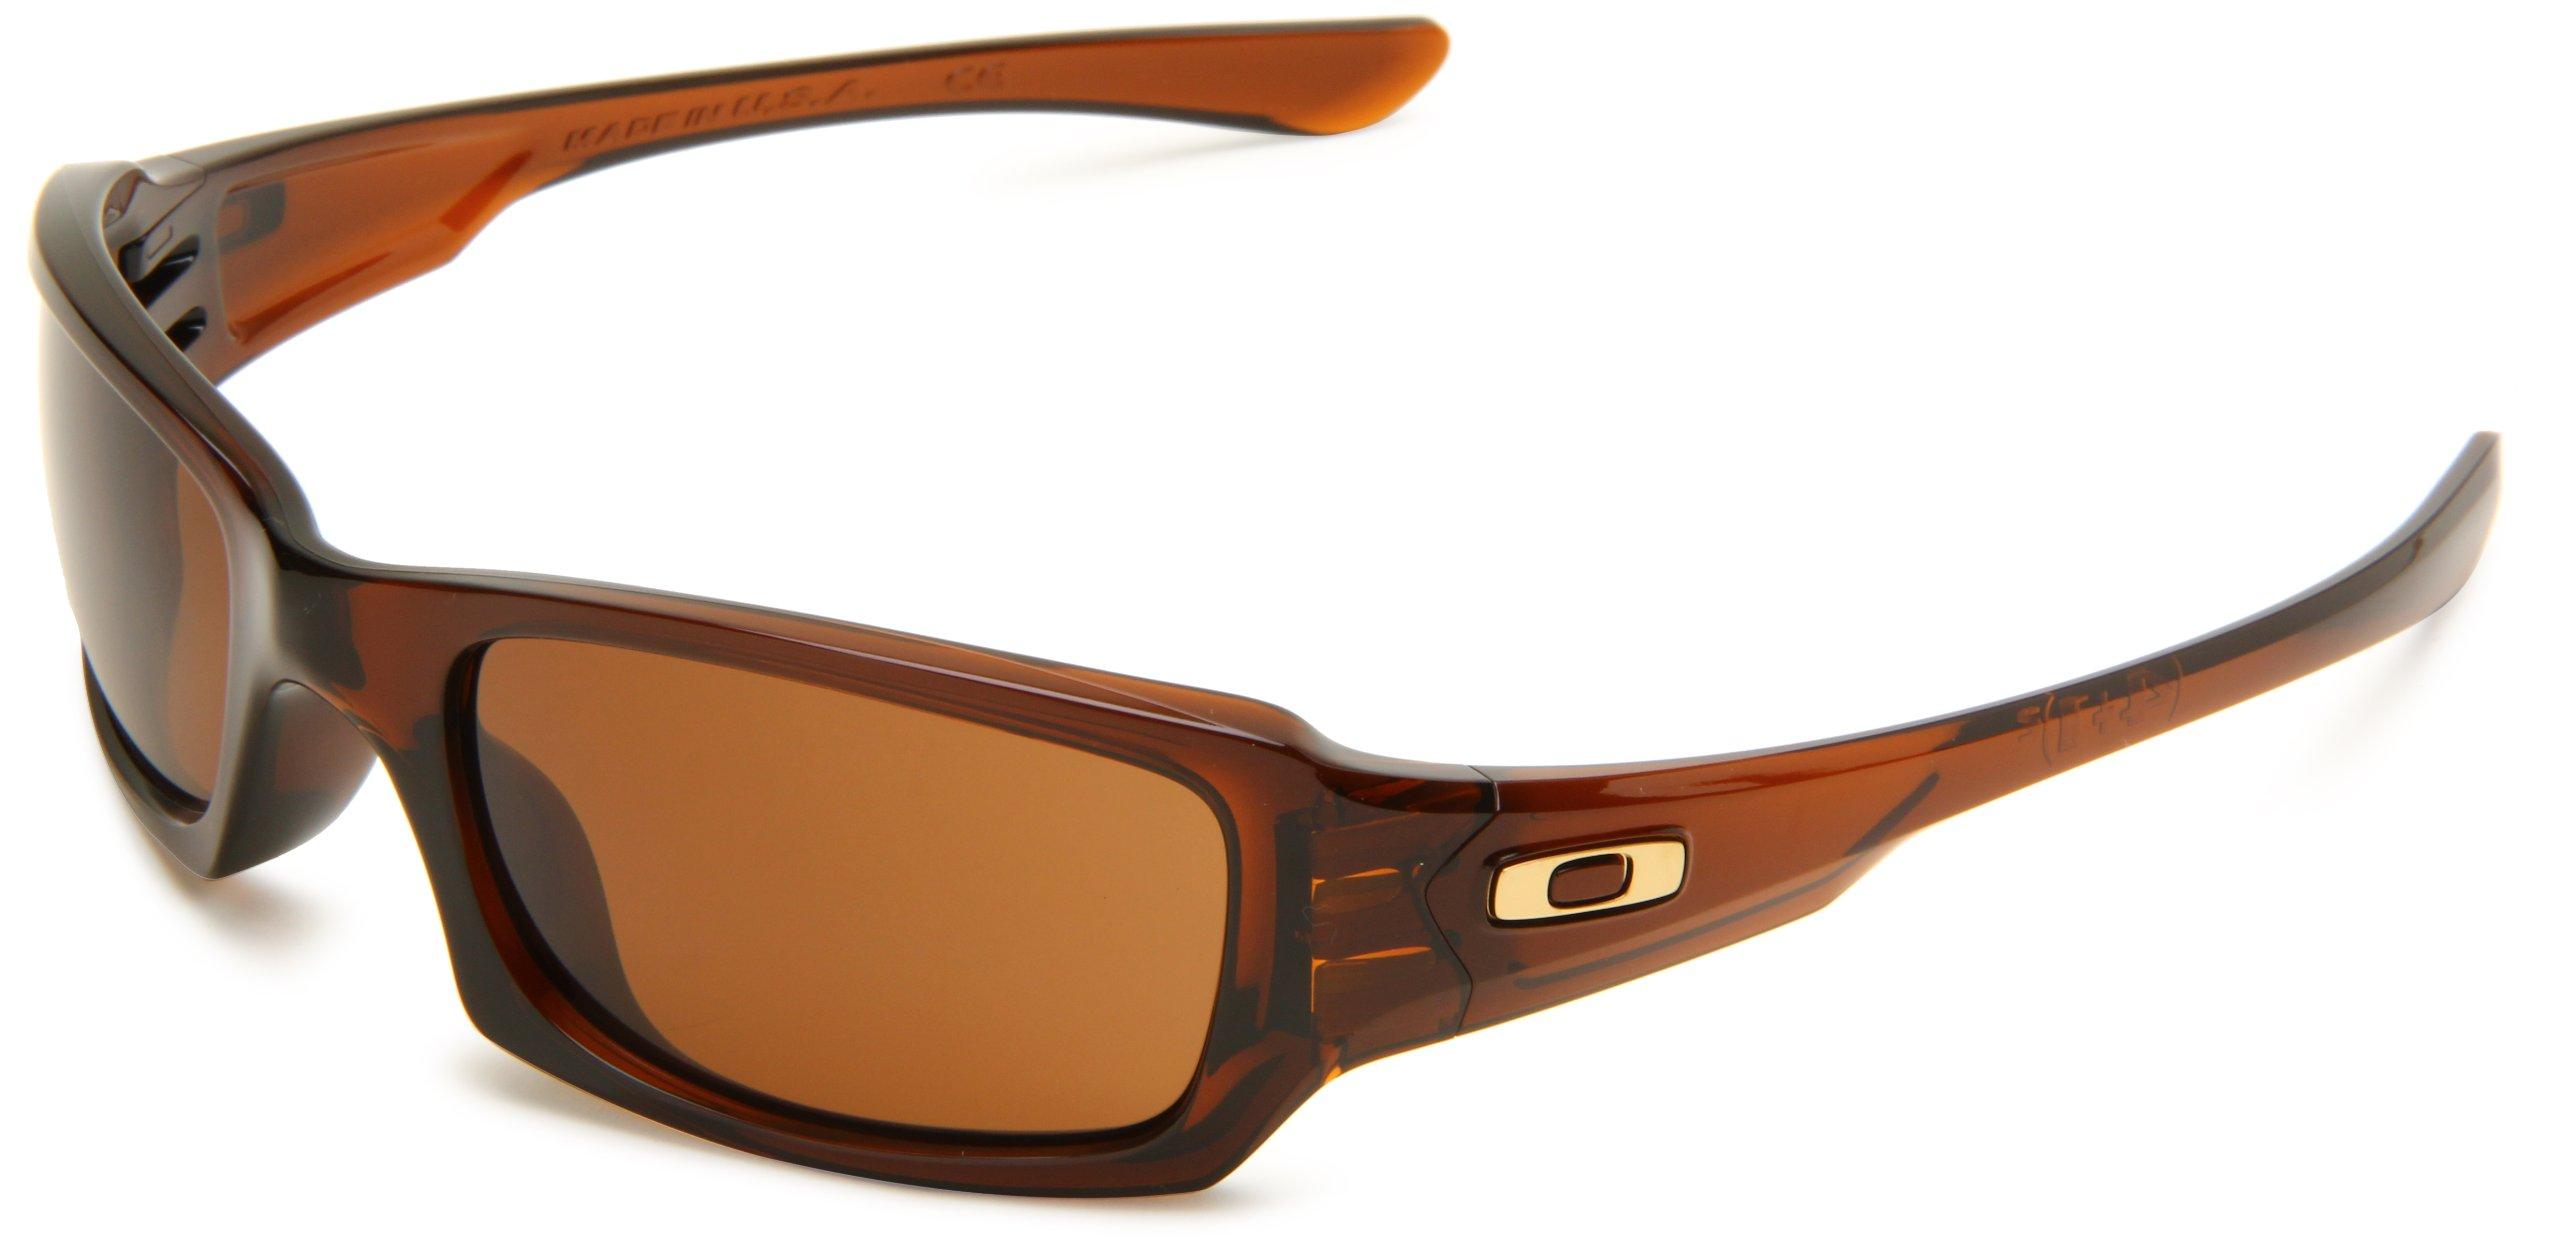 3f79186695 ... wholesale get quotations oakley fives squared sunglasses 83396 824c5